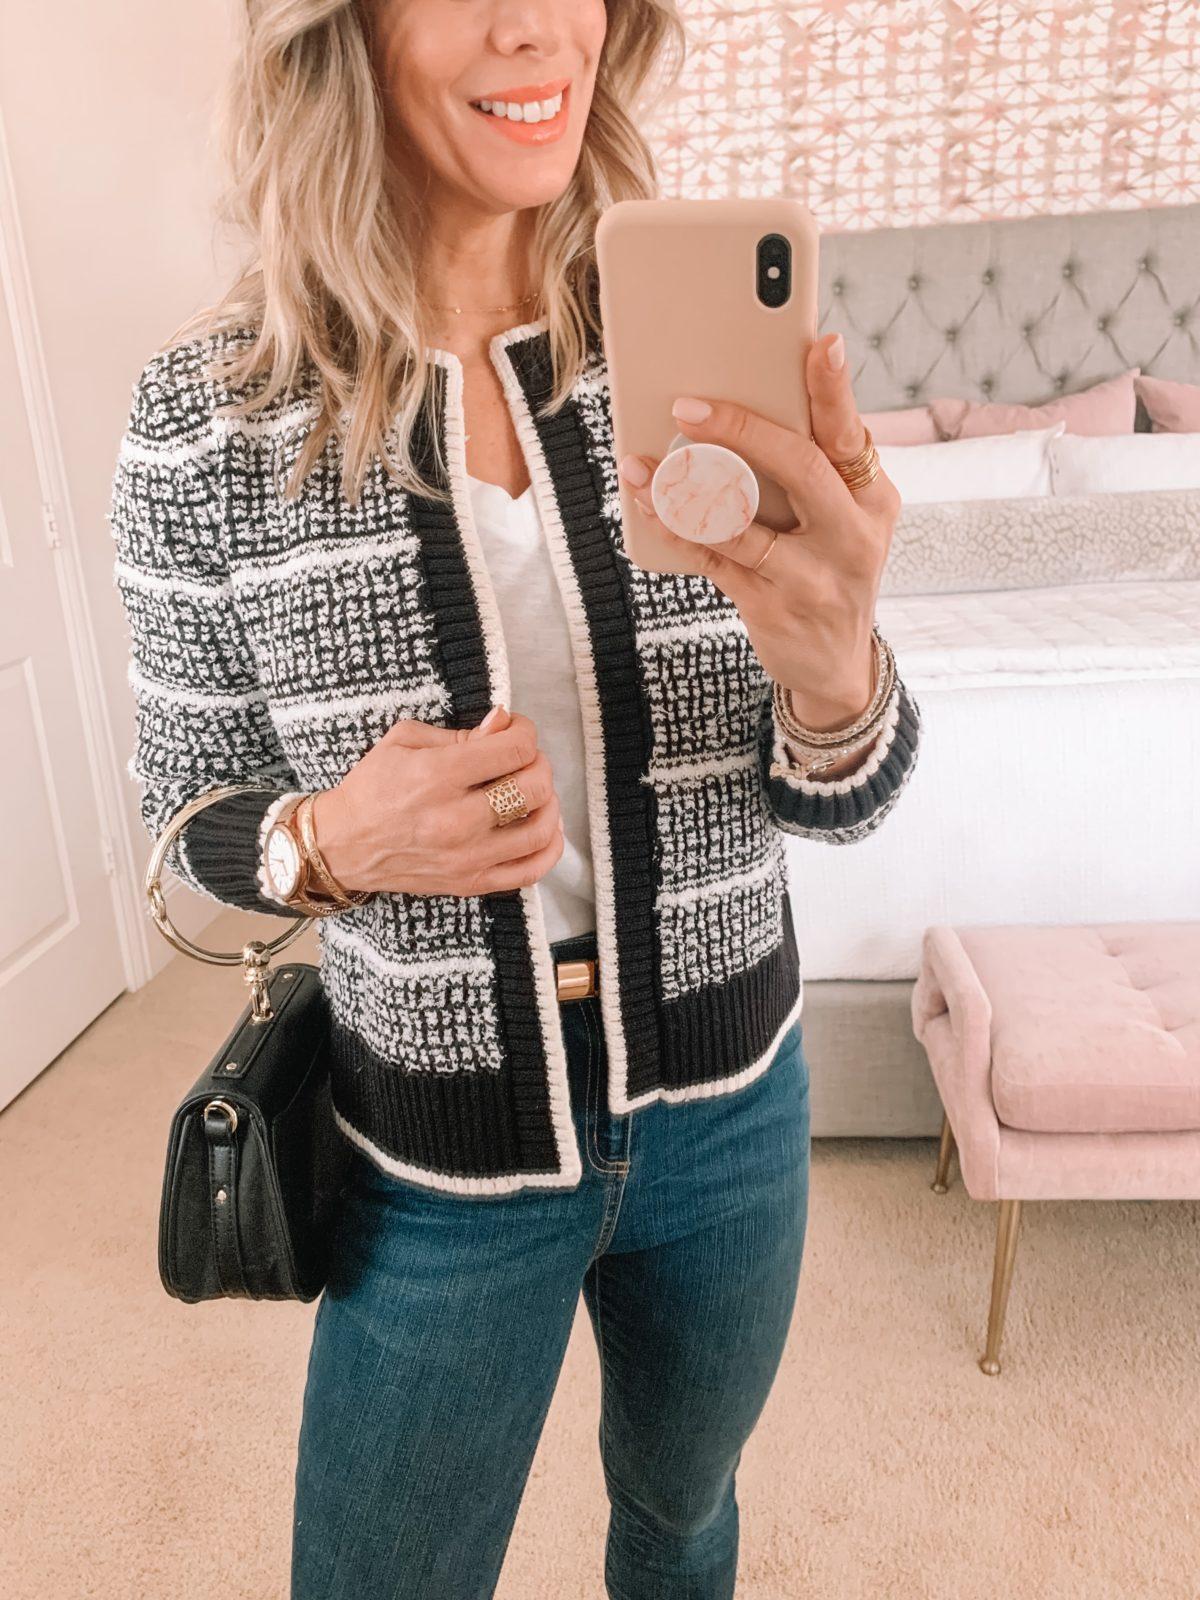 Dressing Room Finds, Tee, Tweed Jacket, Jeans, Heels, Clutch Purse